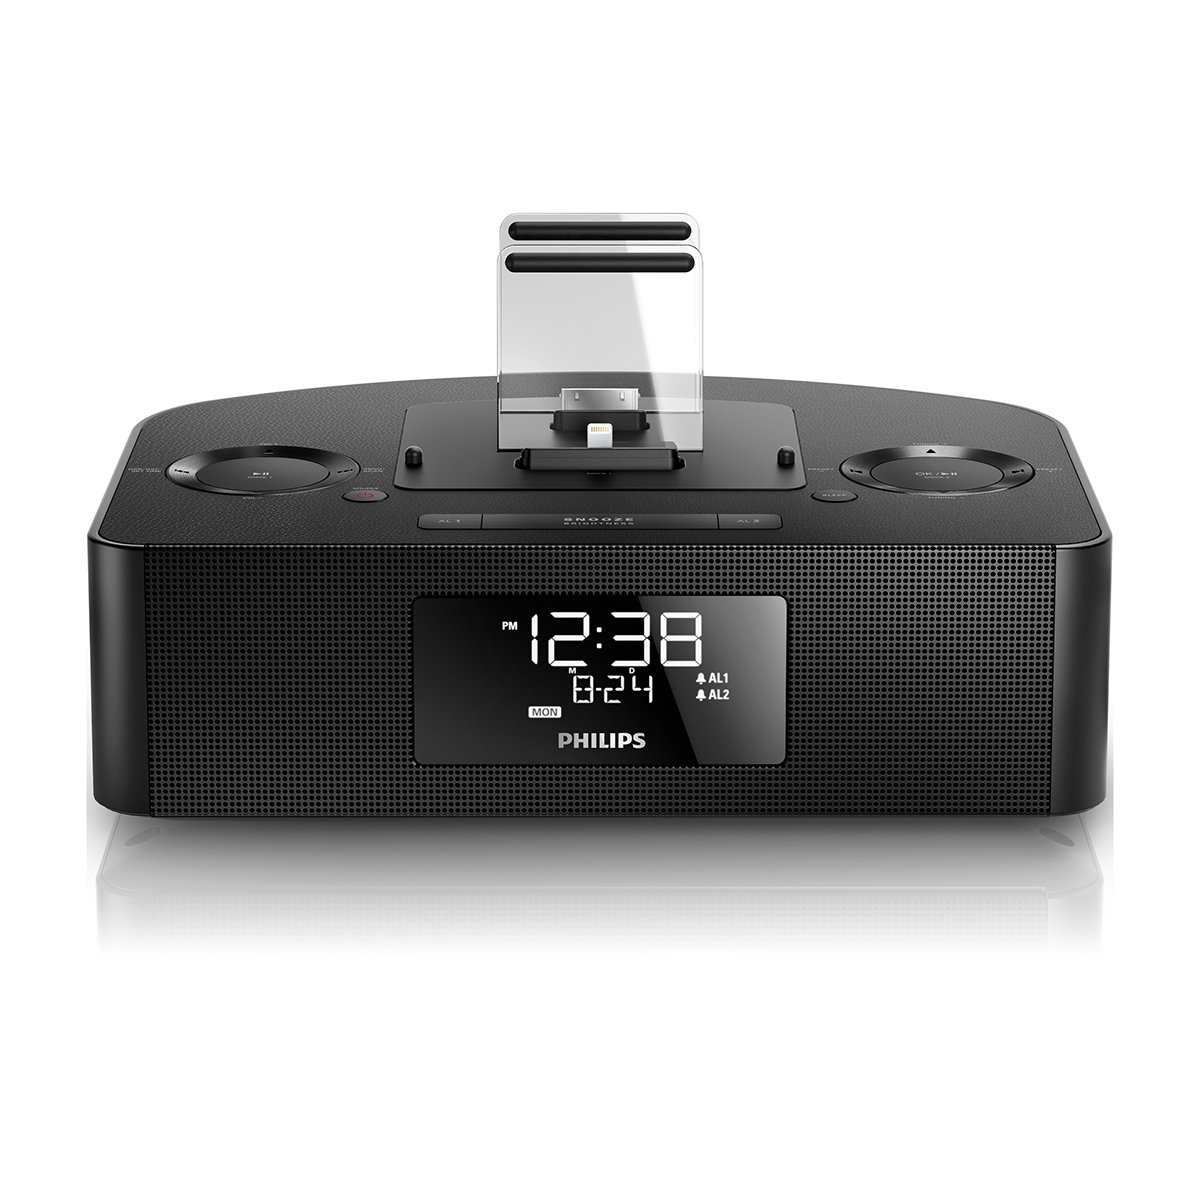 Philips AJ7260D/37 - Radio (Reloj, FM, 87,5-108 MHz, 8 W, LCD, Blanco): Amazon.es: Electrónica